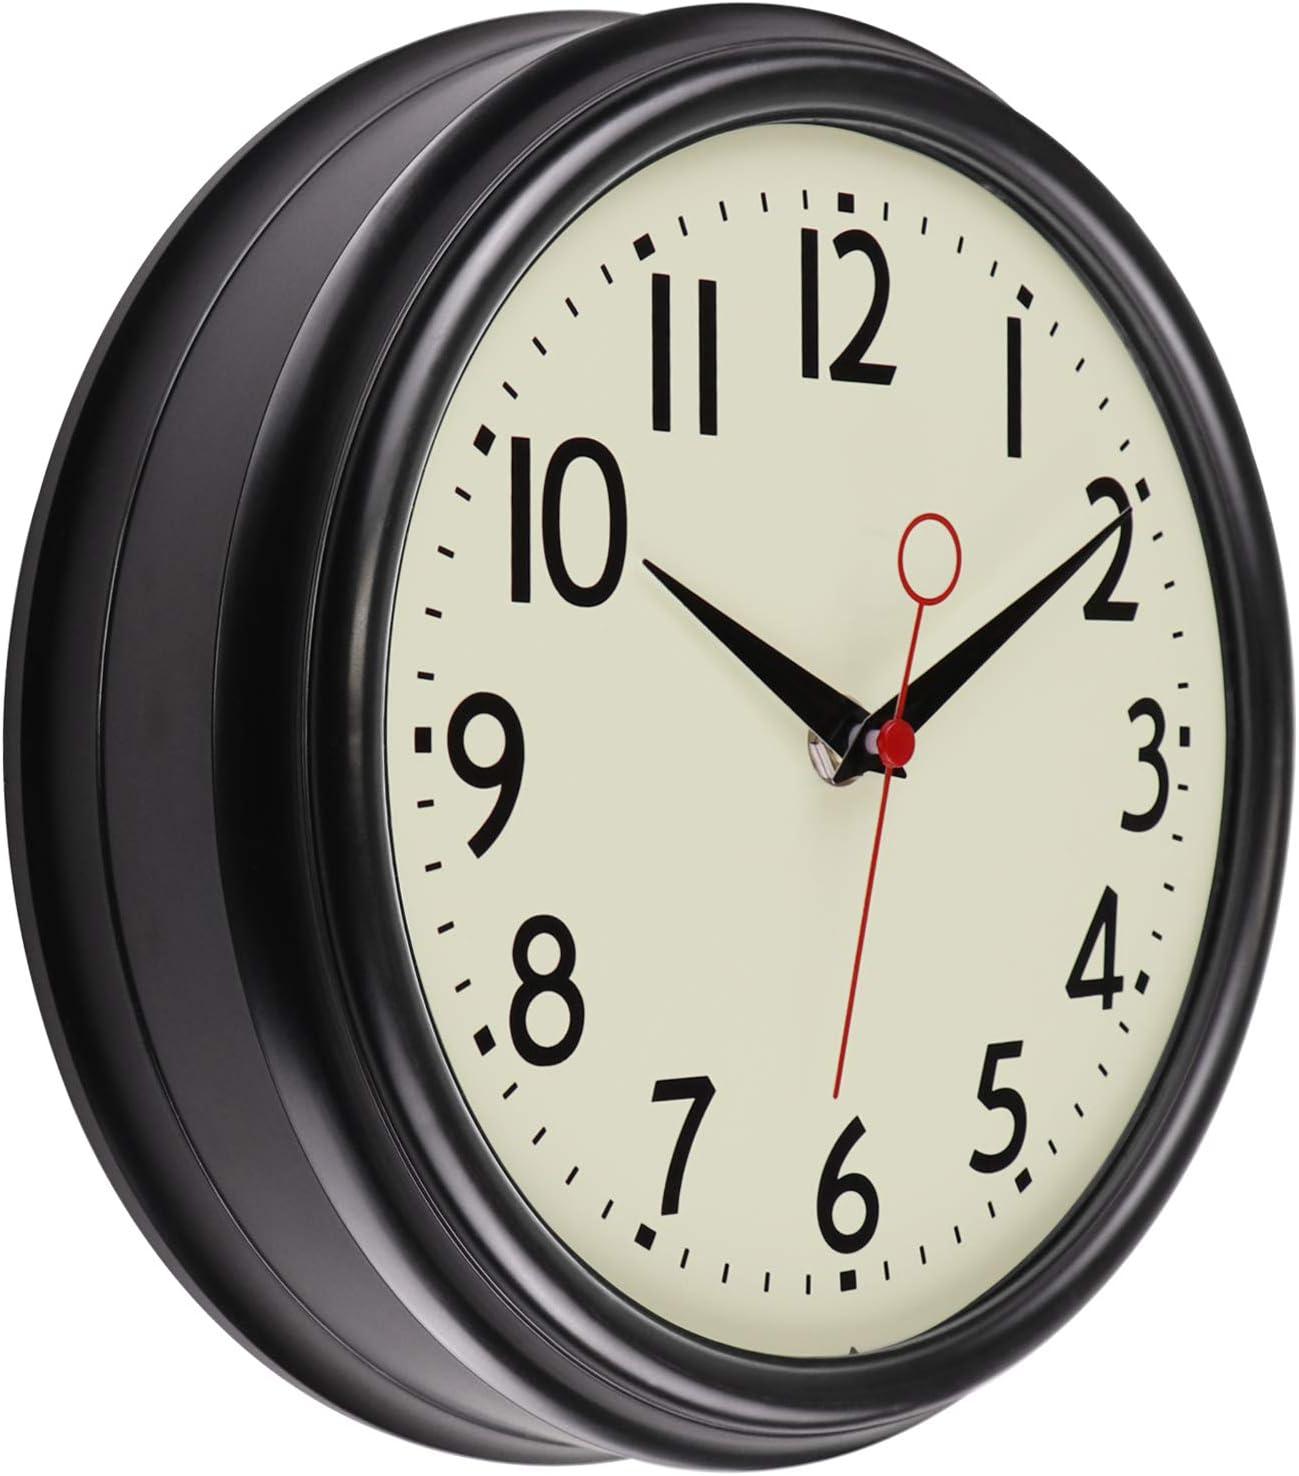 Lumuasky Retro Wall Clock 9.5 Inch 50's Louisville-Jefferson County Mall R Design Manufacturer regenerated product Kitchen Vintage